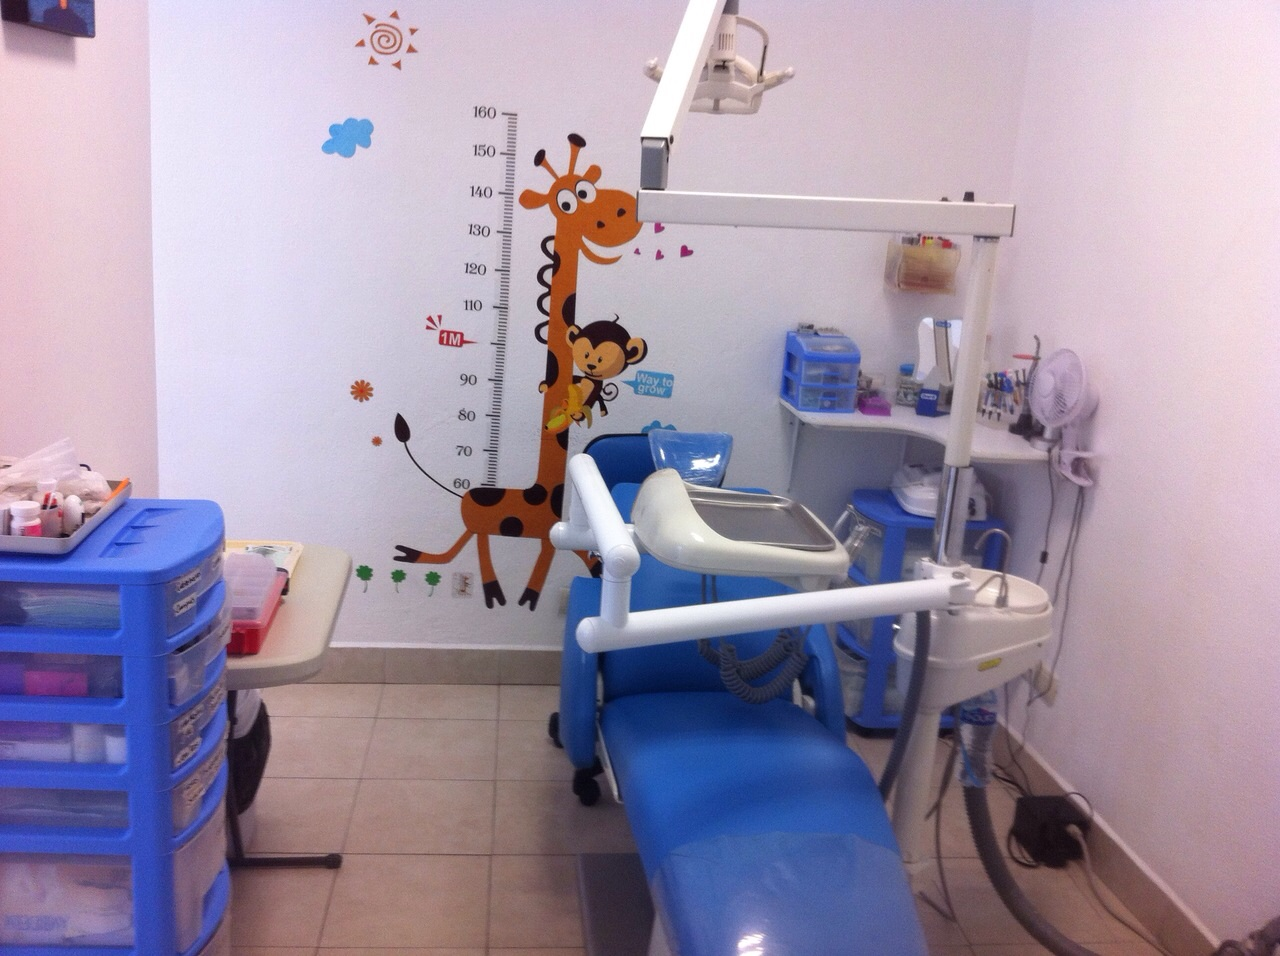 Grupo Odontologico San Miguel de Allende